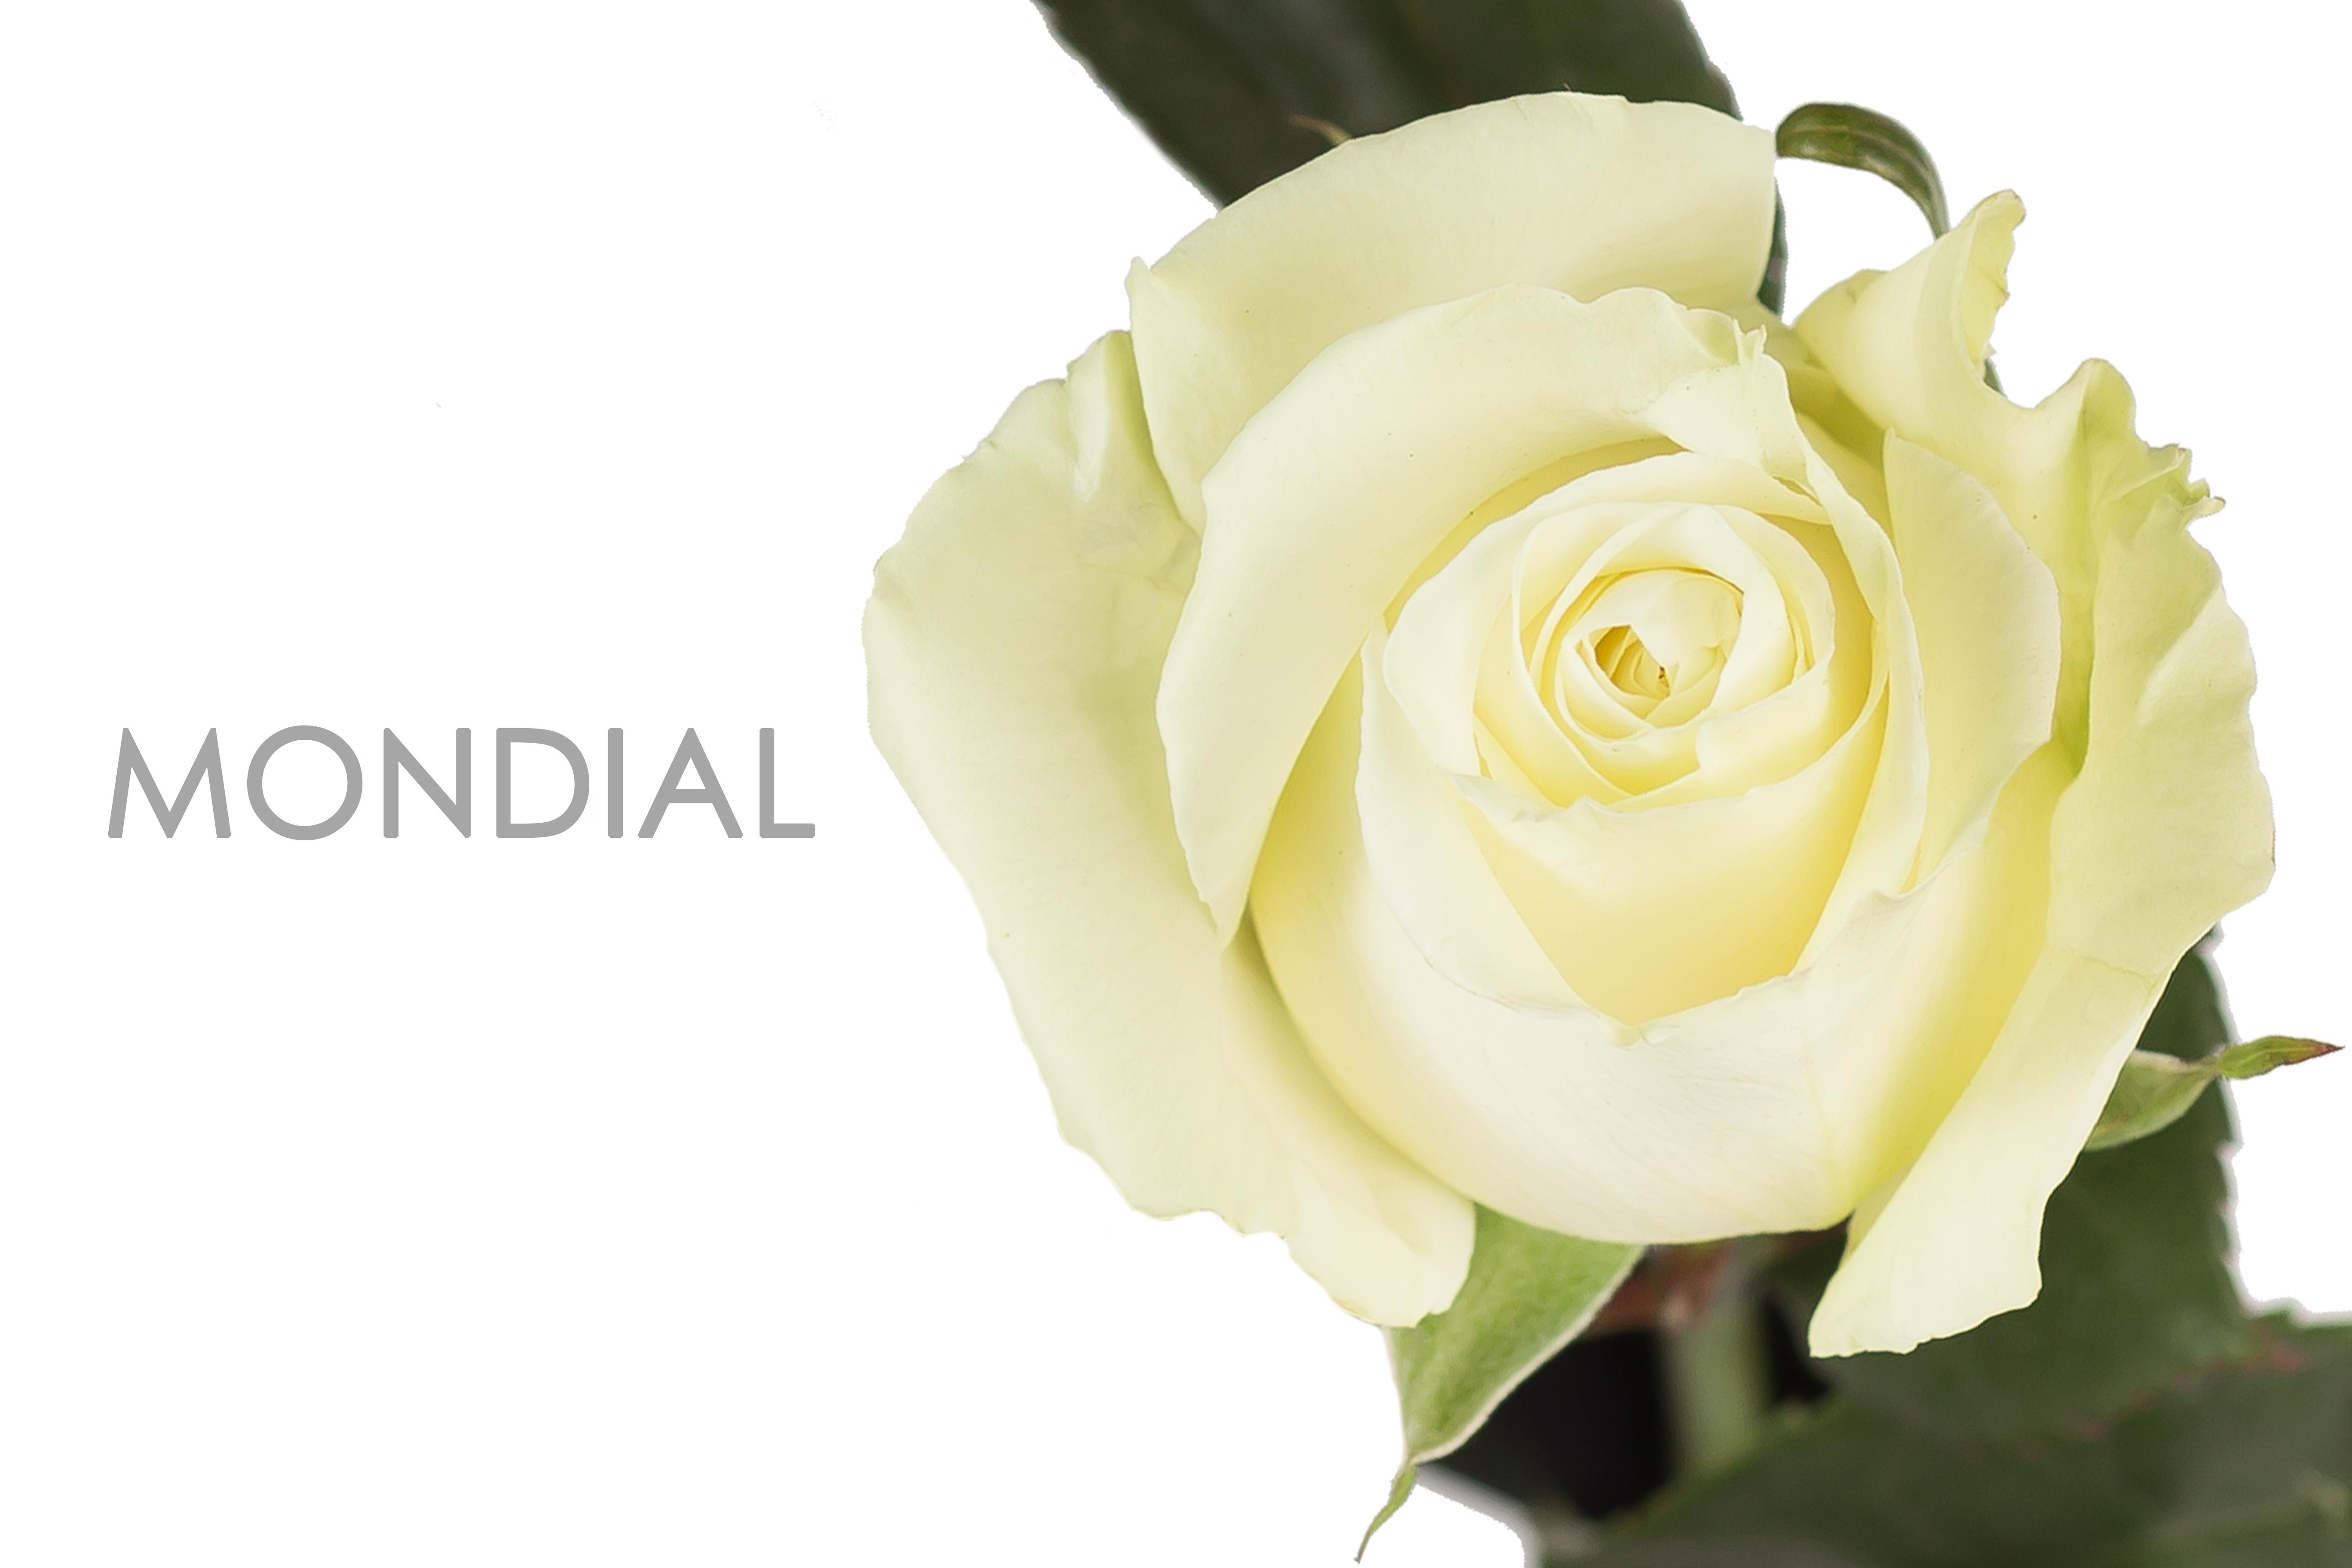 MONDIAL-CAPTION-UNIDAD